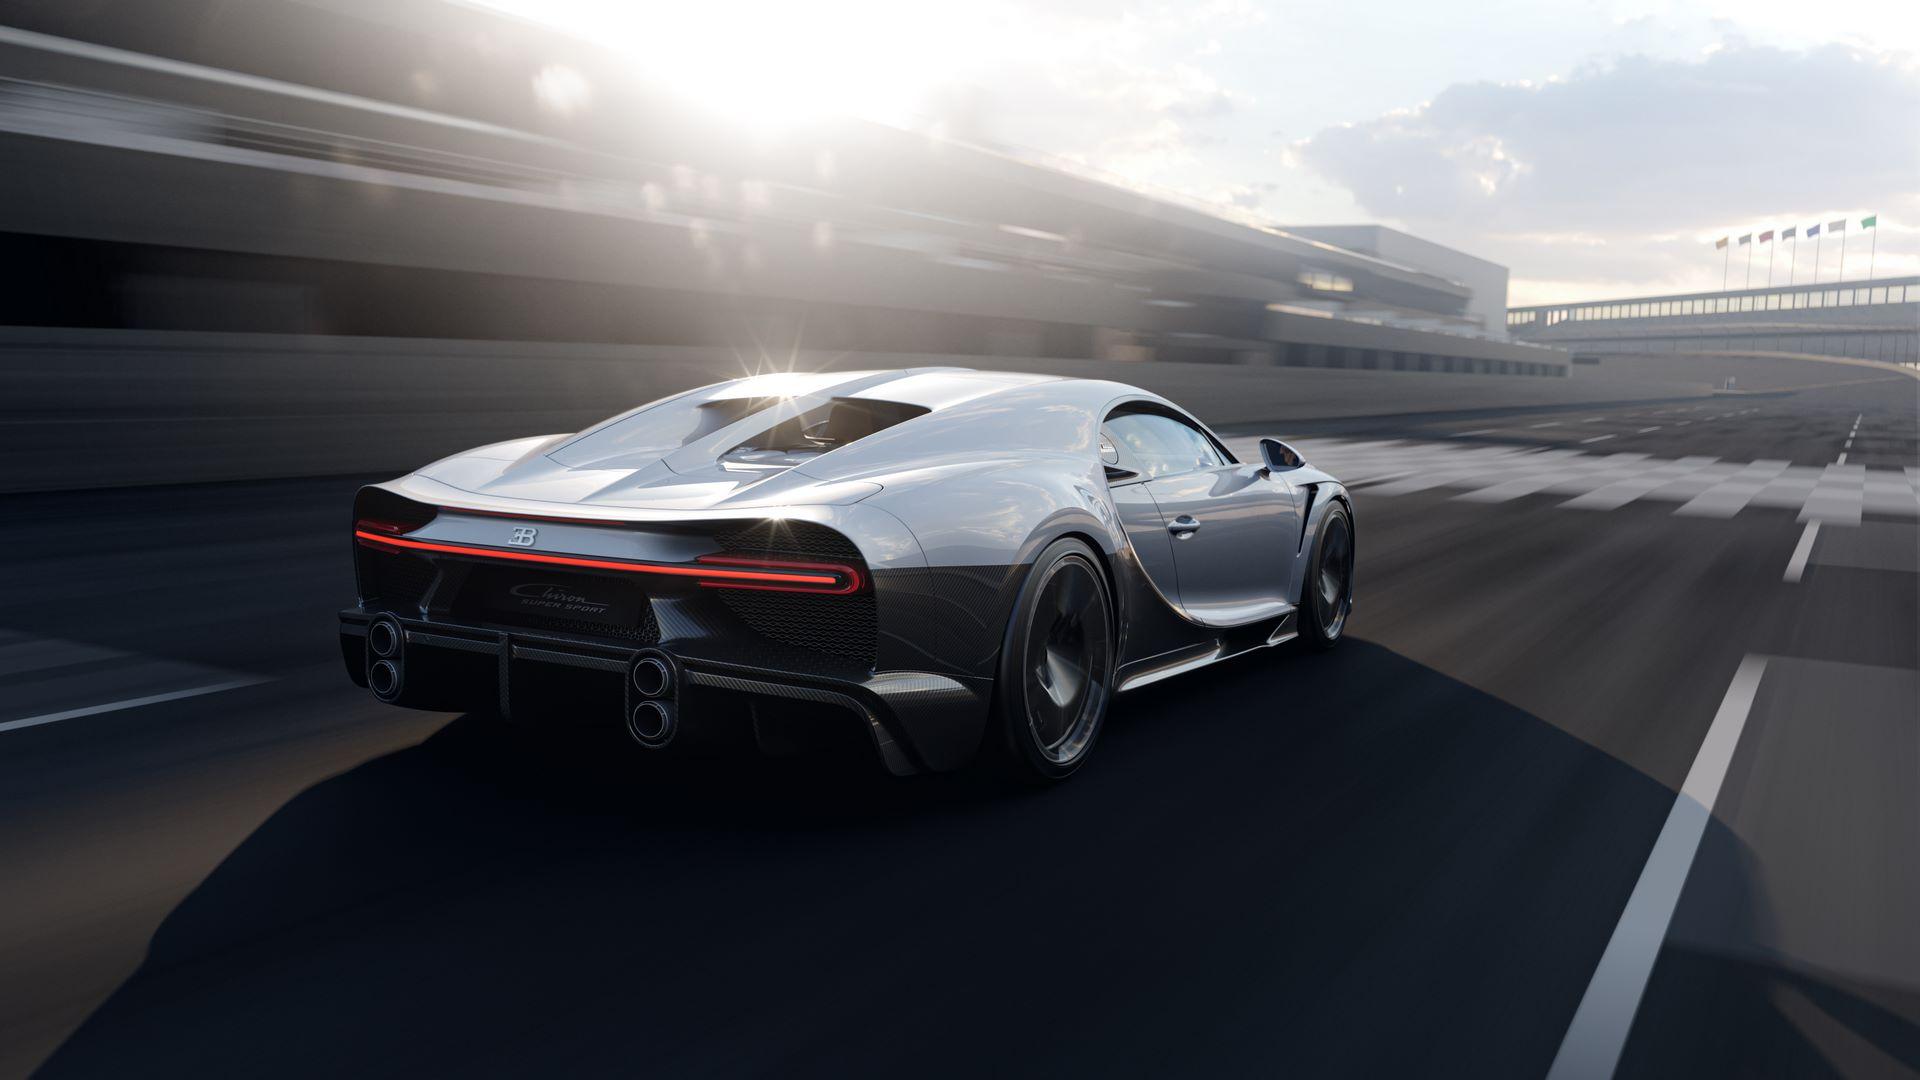 02_06_bugatti_chiron_super_sport_high_speed_rear